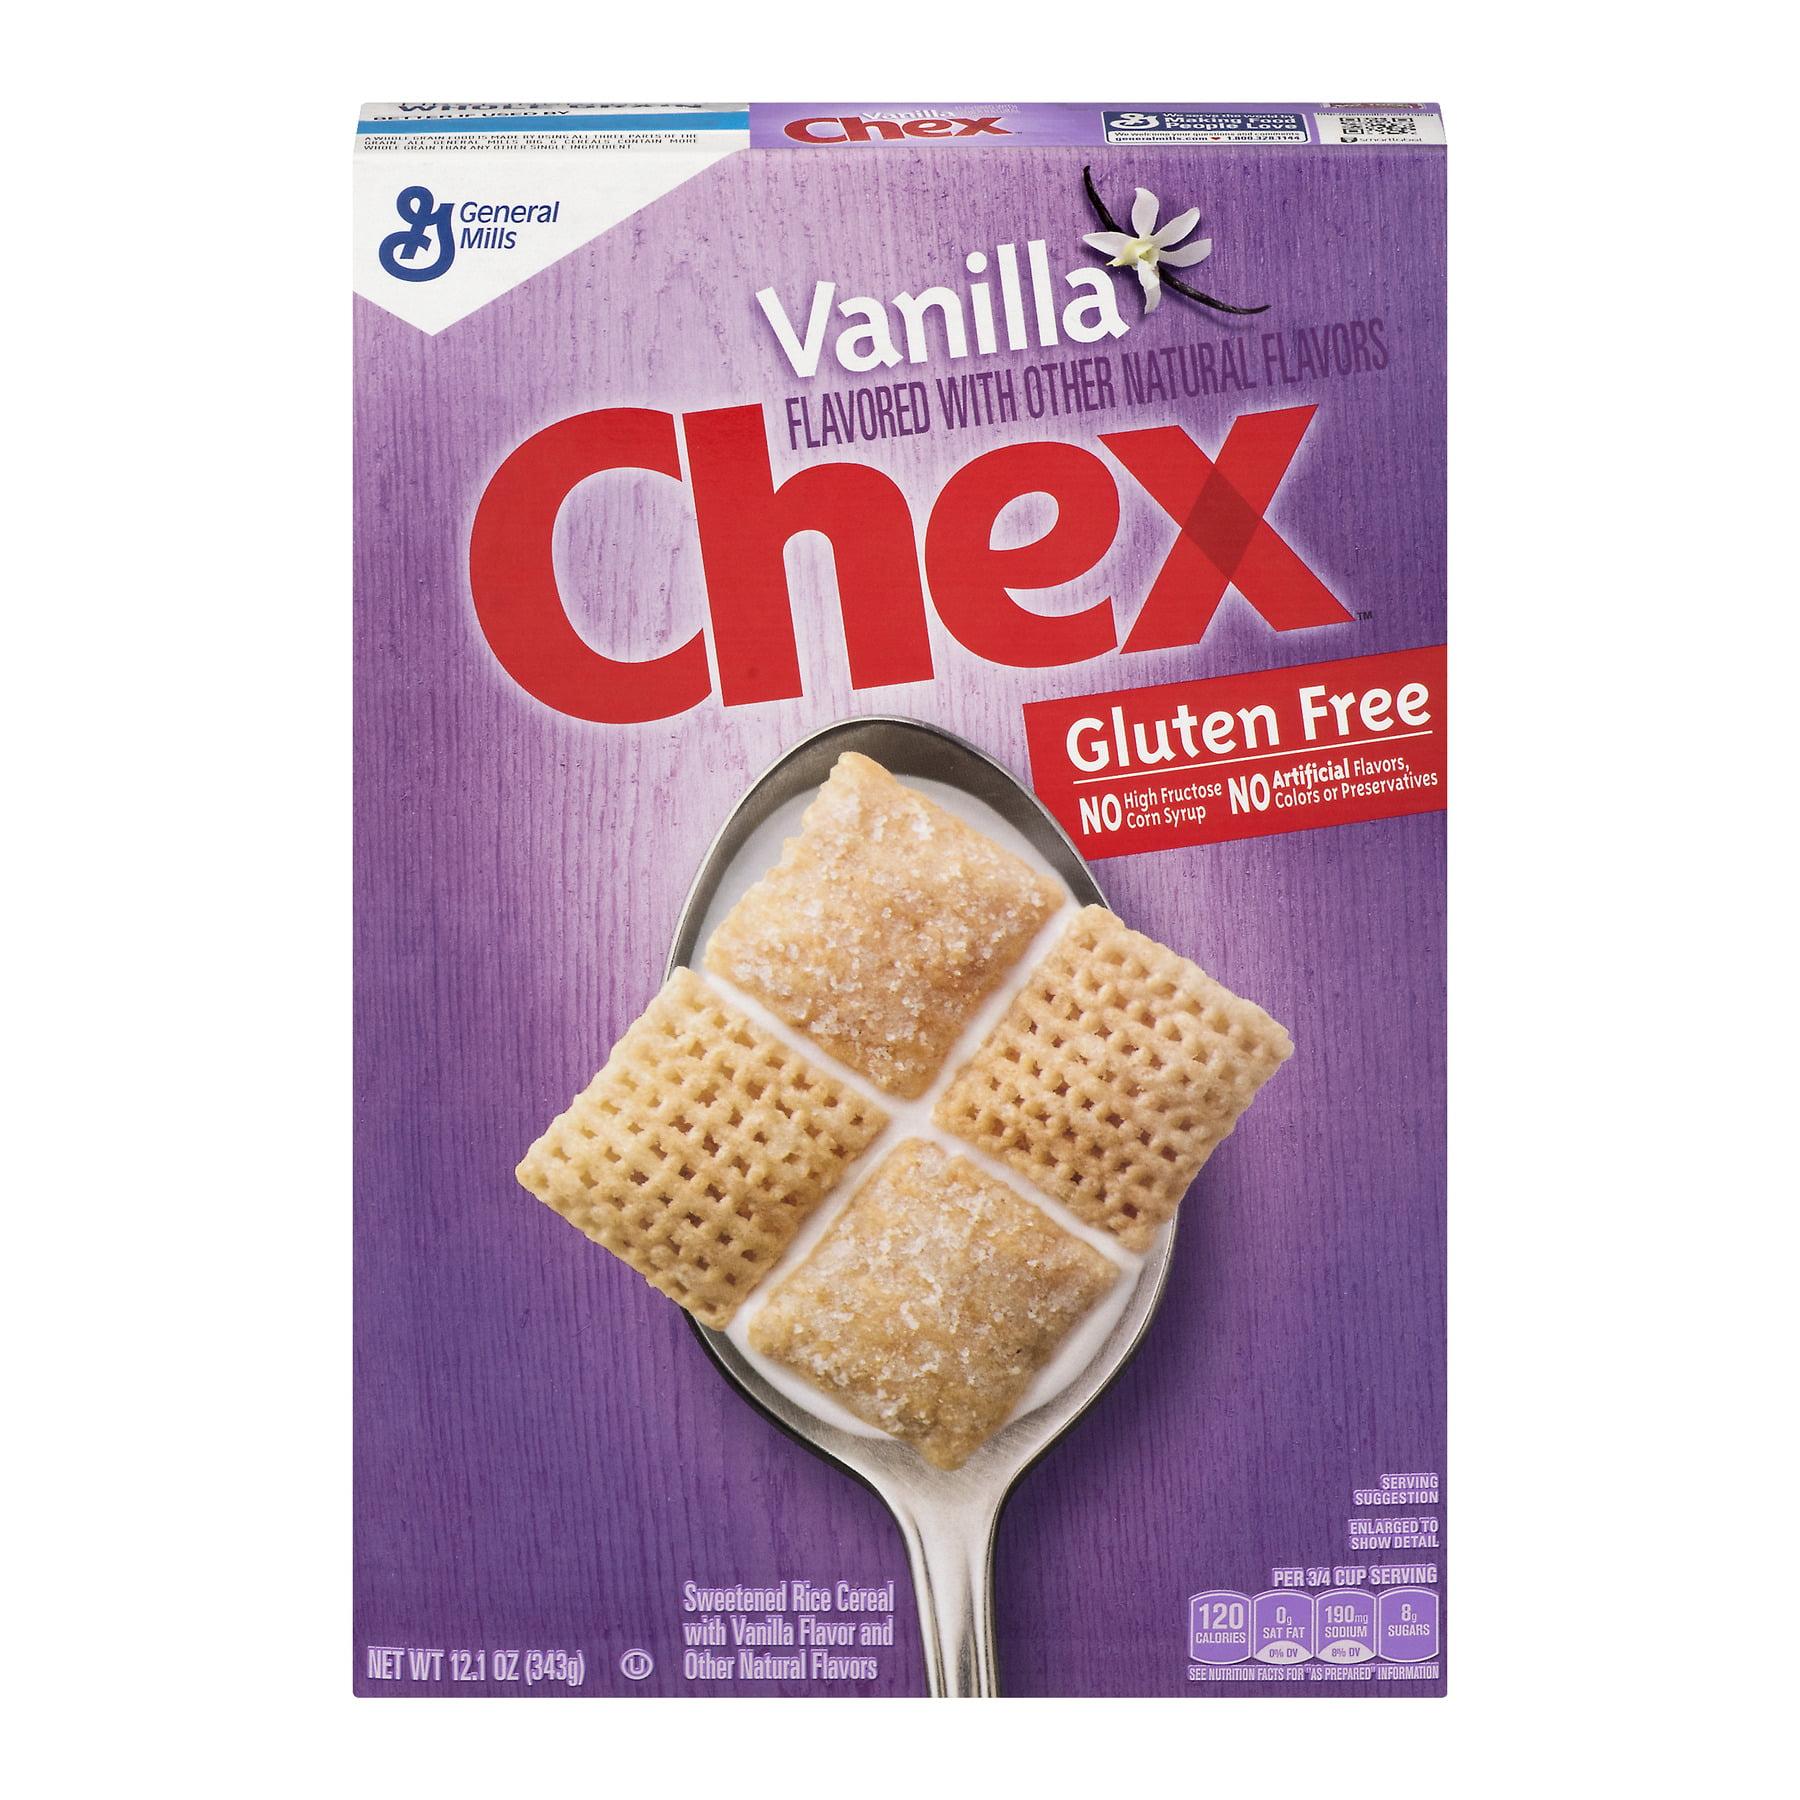 General Mills, Inc. Vanilla Chex Gluten Free Cereal 12.1 oz Box